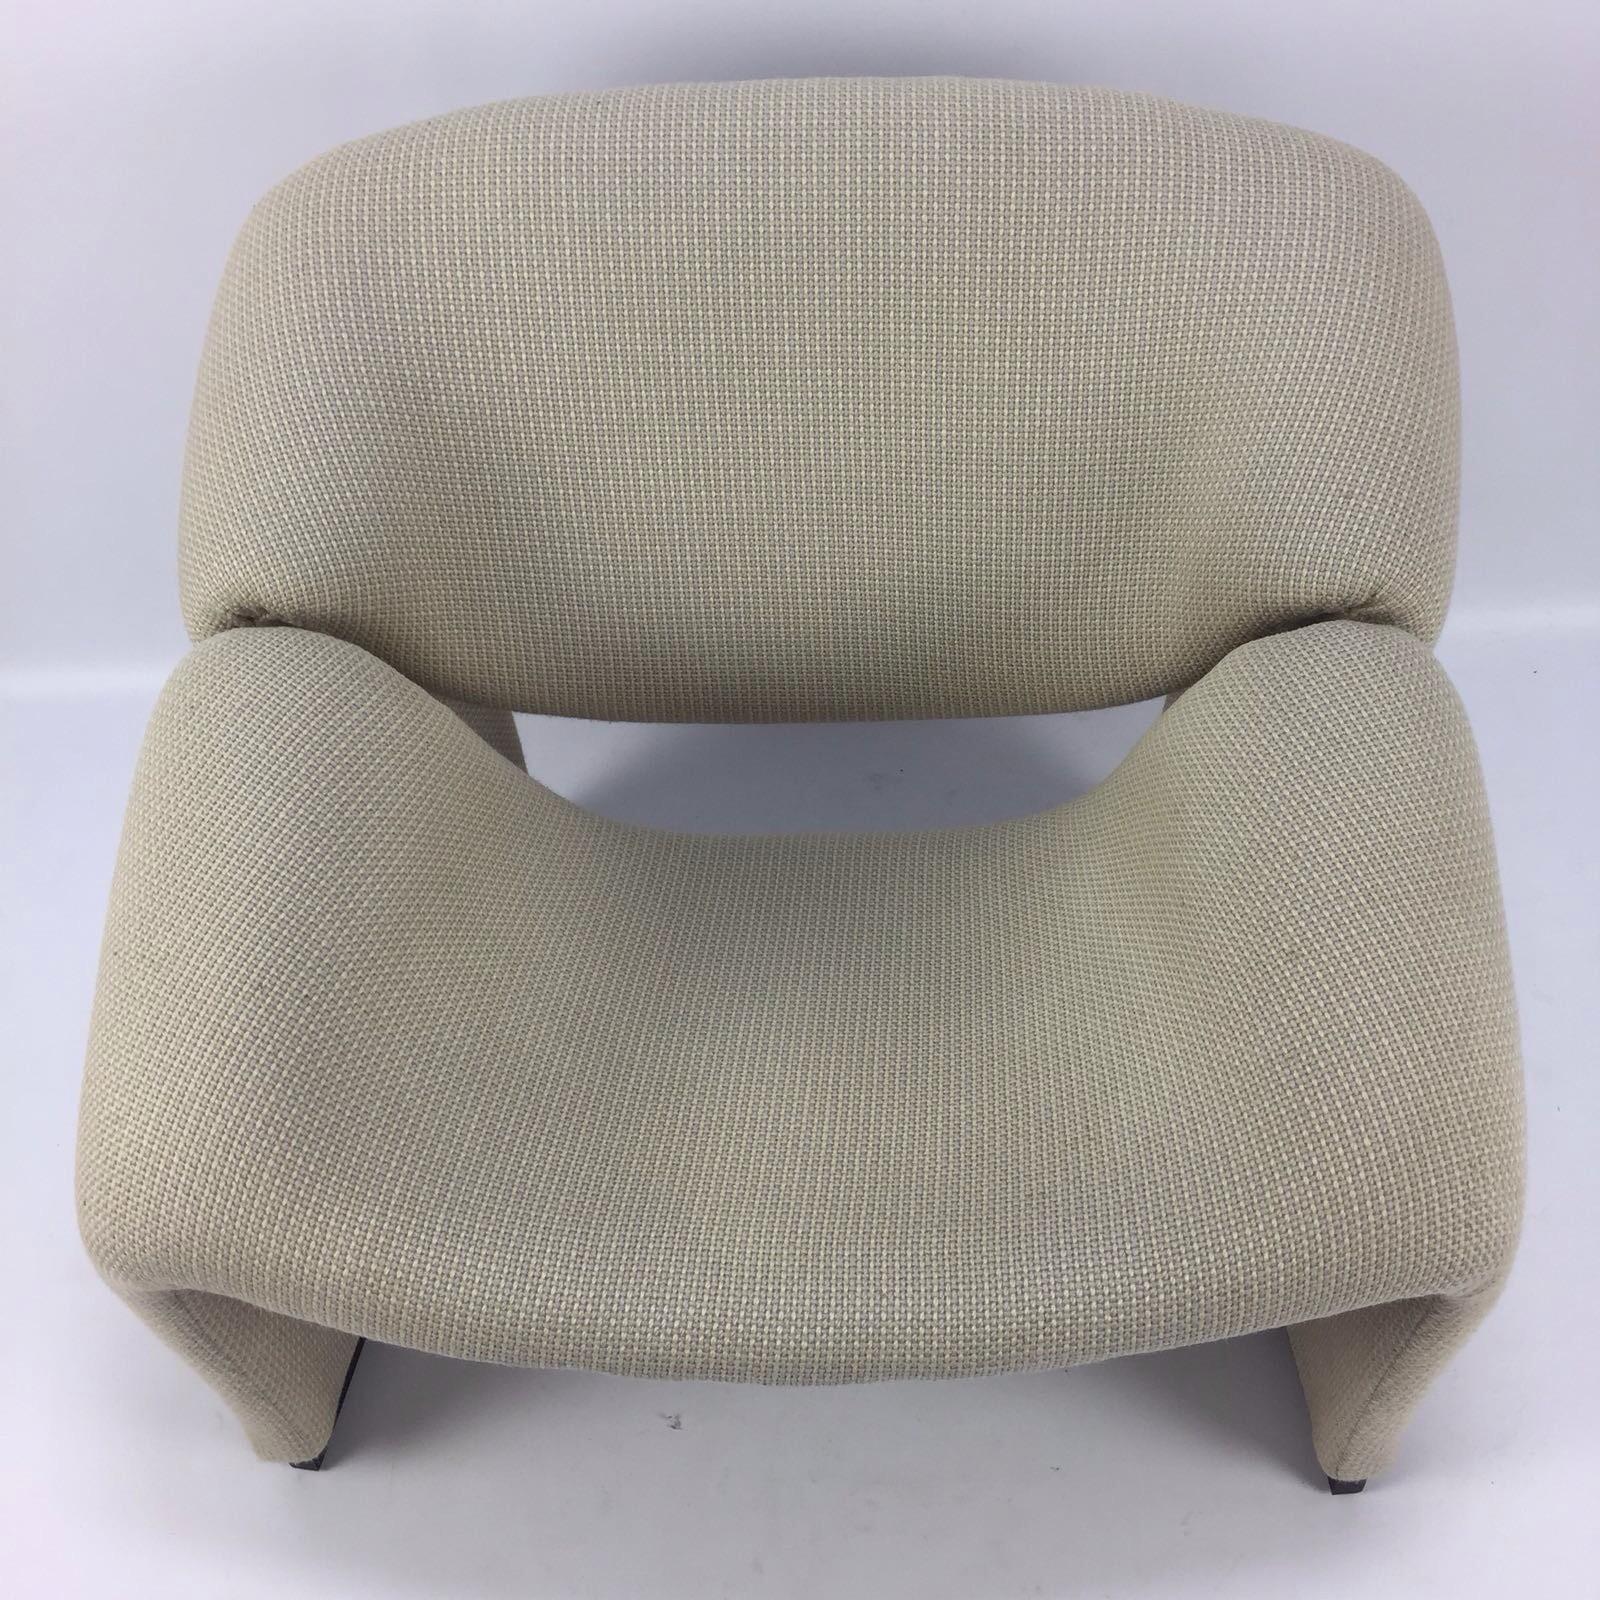 Vintage Groovy Chair F598 By Pierre Paulin For Artifort